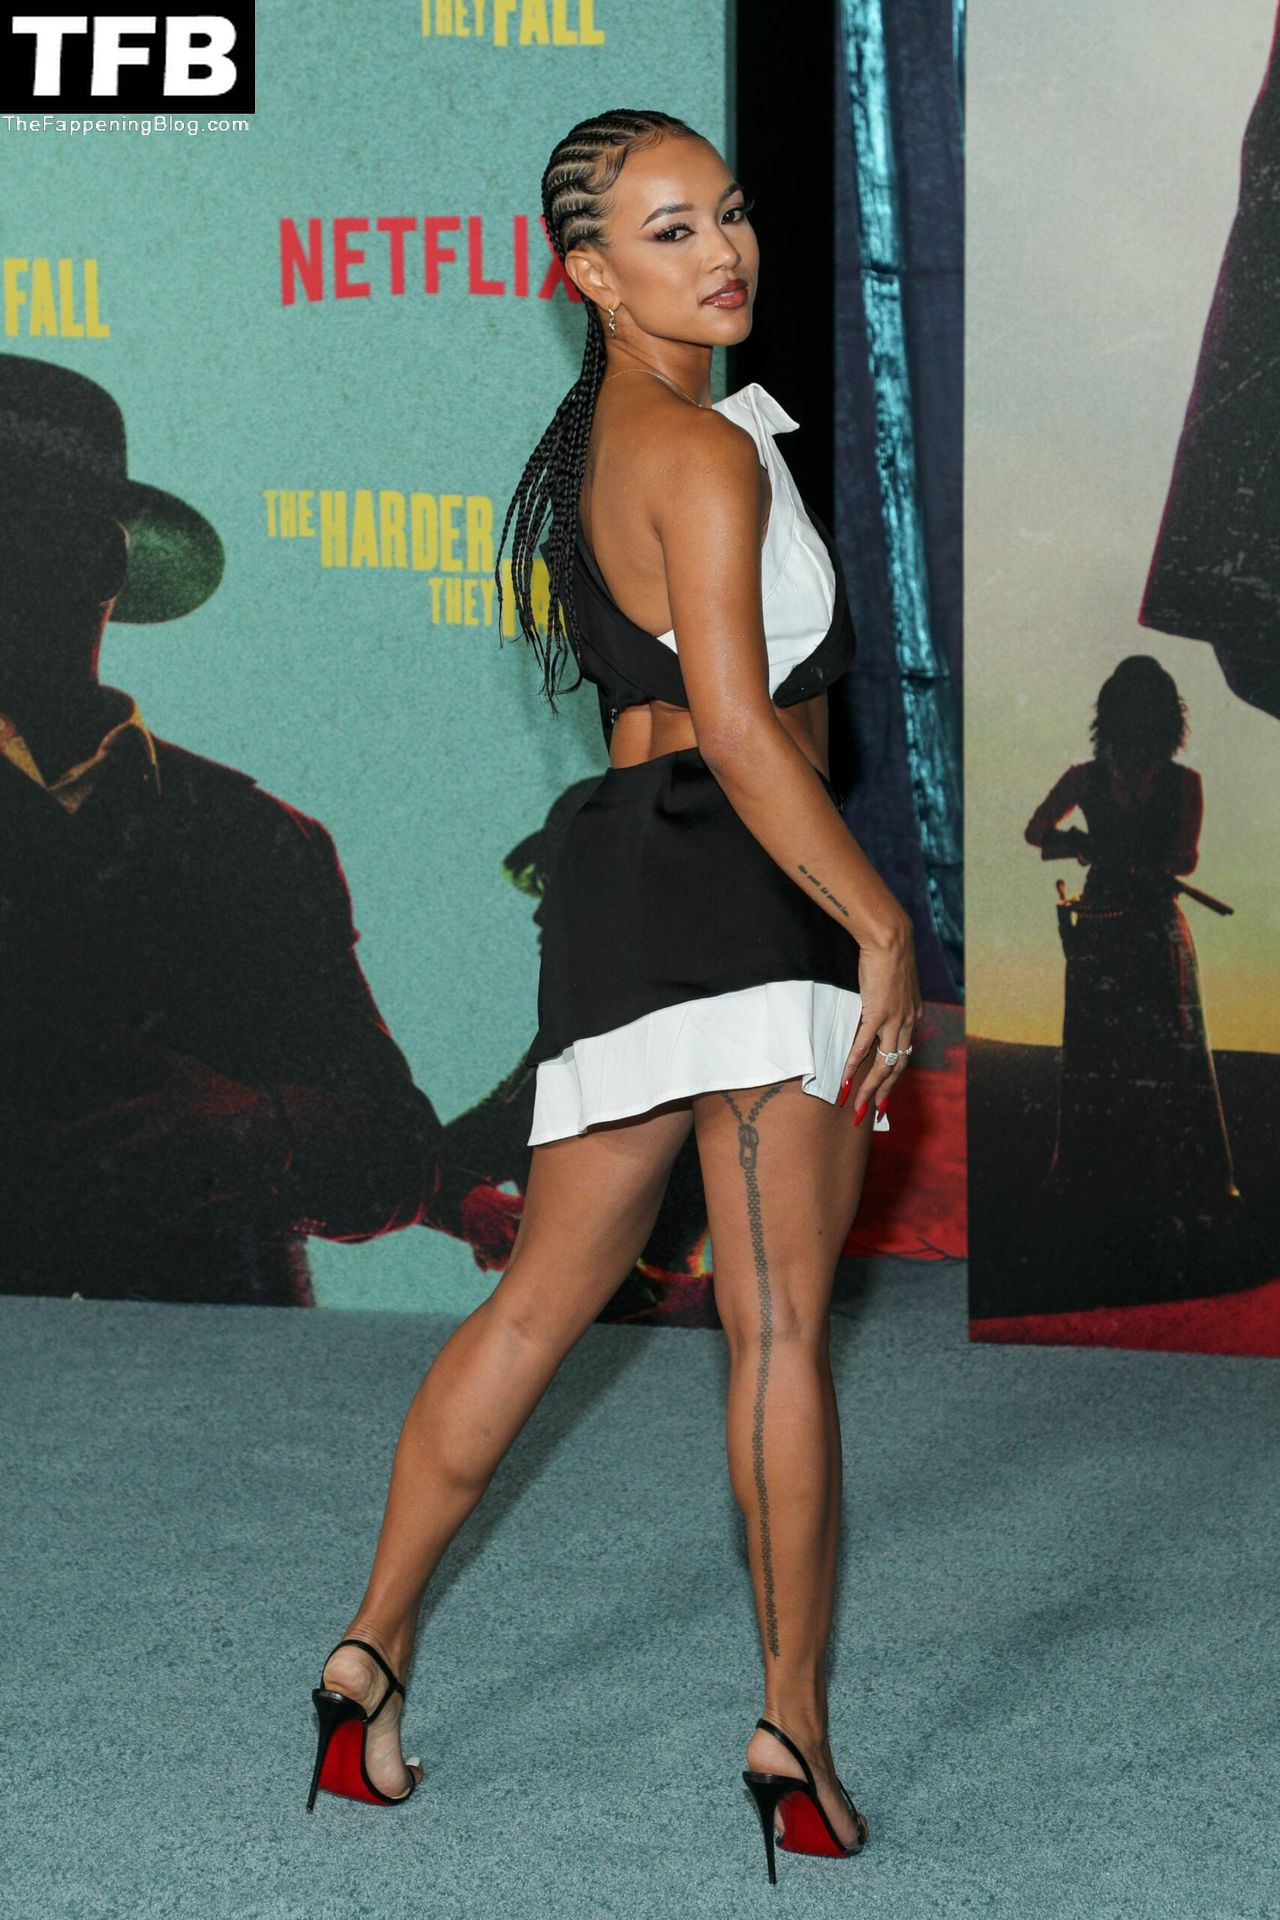 Karrueche-Tran-Sexy-Legs-Upskirt-The-Fappening-Blog-30.jpg